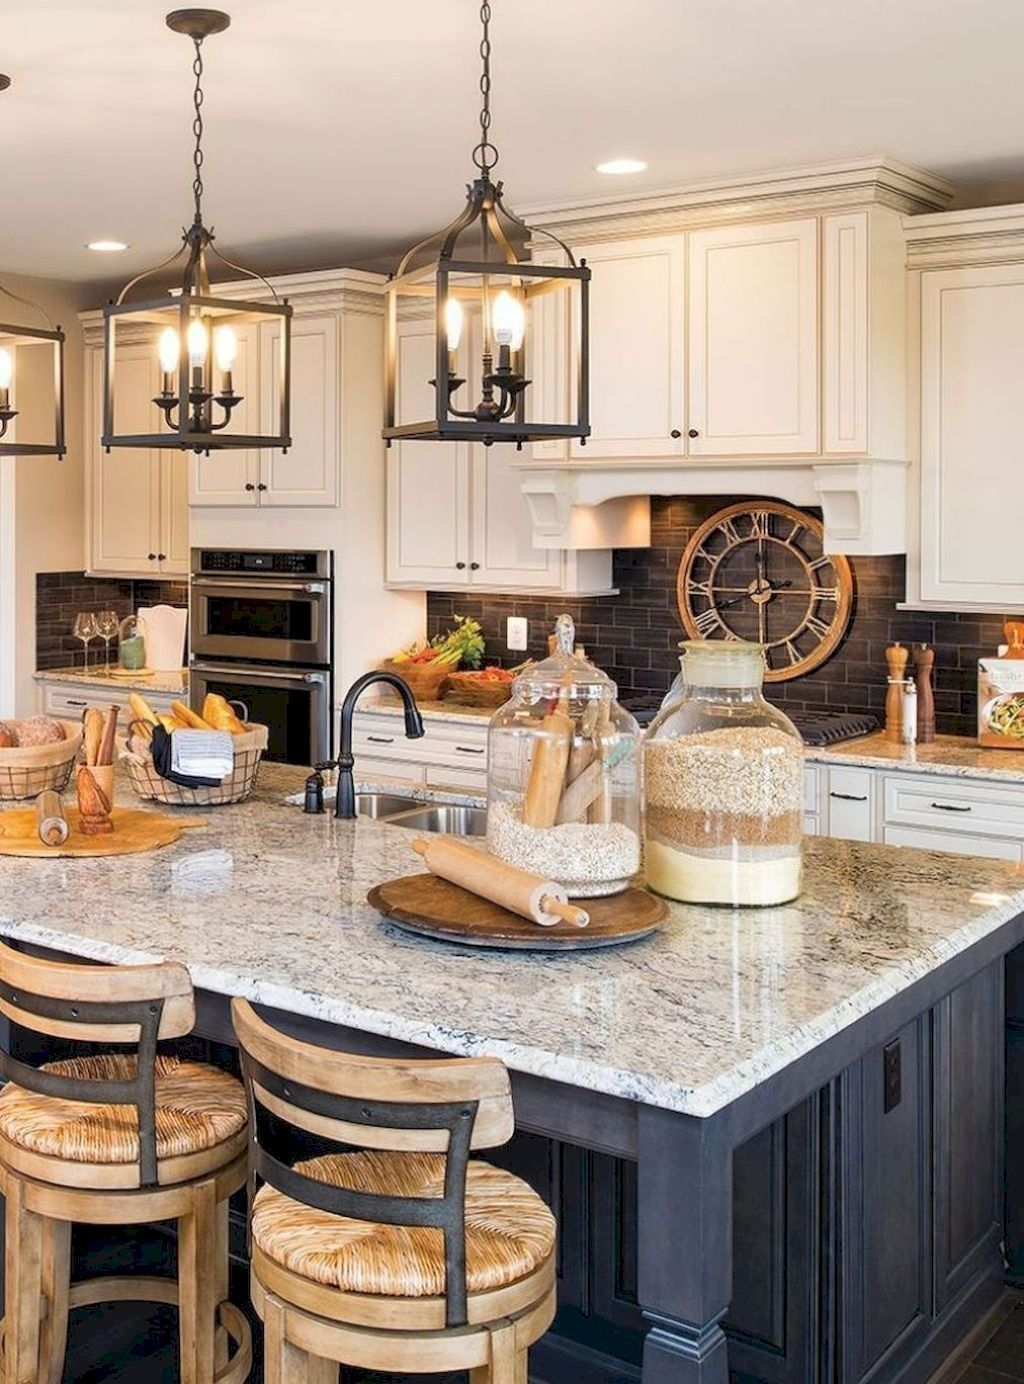 50 amazing remodeling farmhouse kitchen decorations kitchen cabinets decor farmhouse kitchen on farmhouse kitchen kitchen id=21515